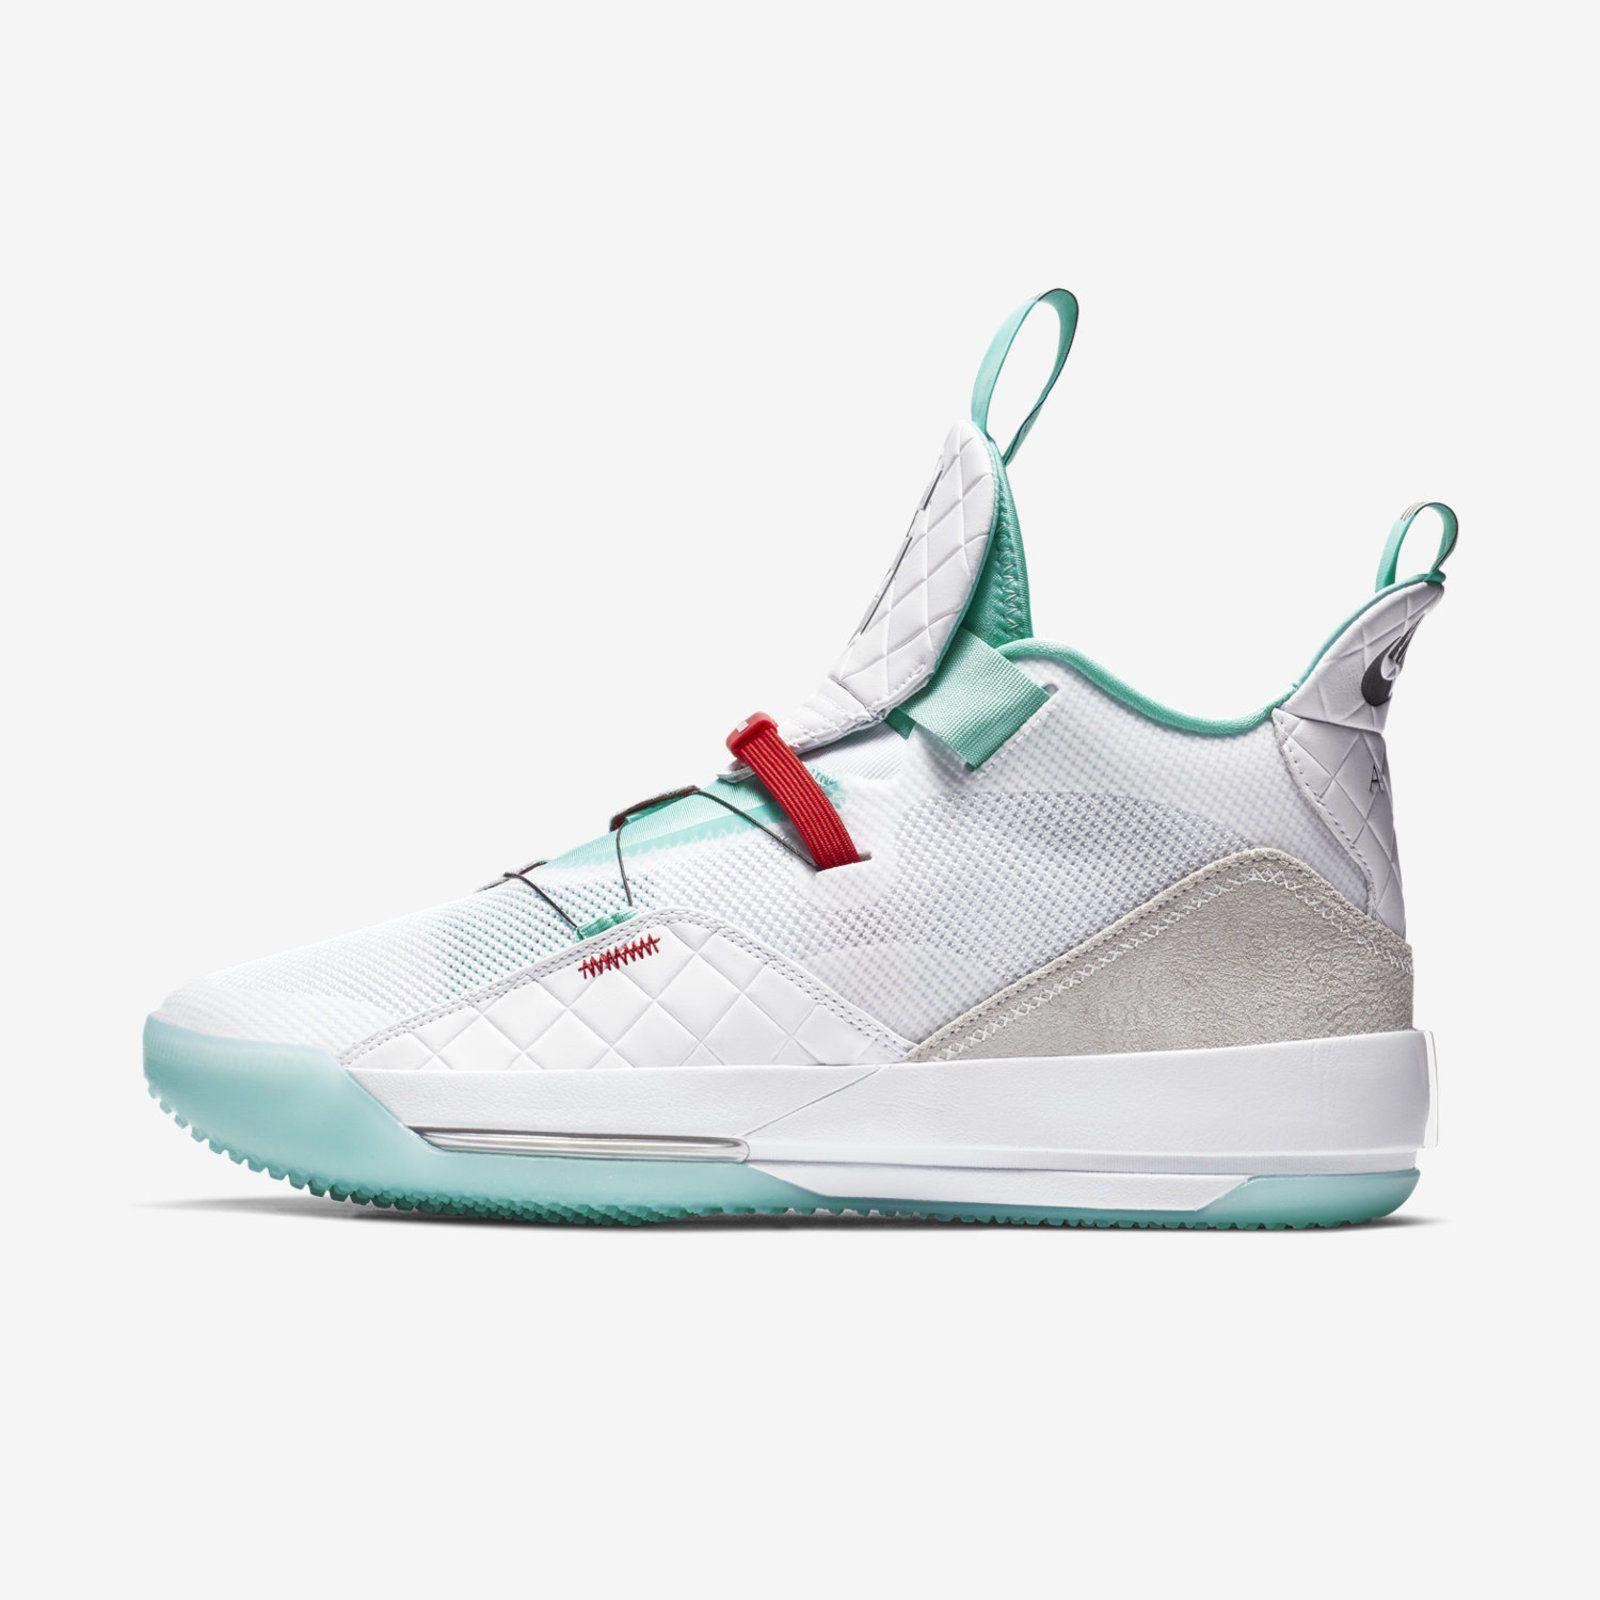 3176989b645 Nike Air Jordan XXXIII 33 PF [BV5072-101] Men Basketball Shoes Guo Ailun